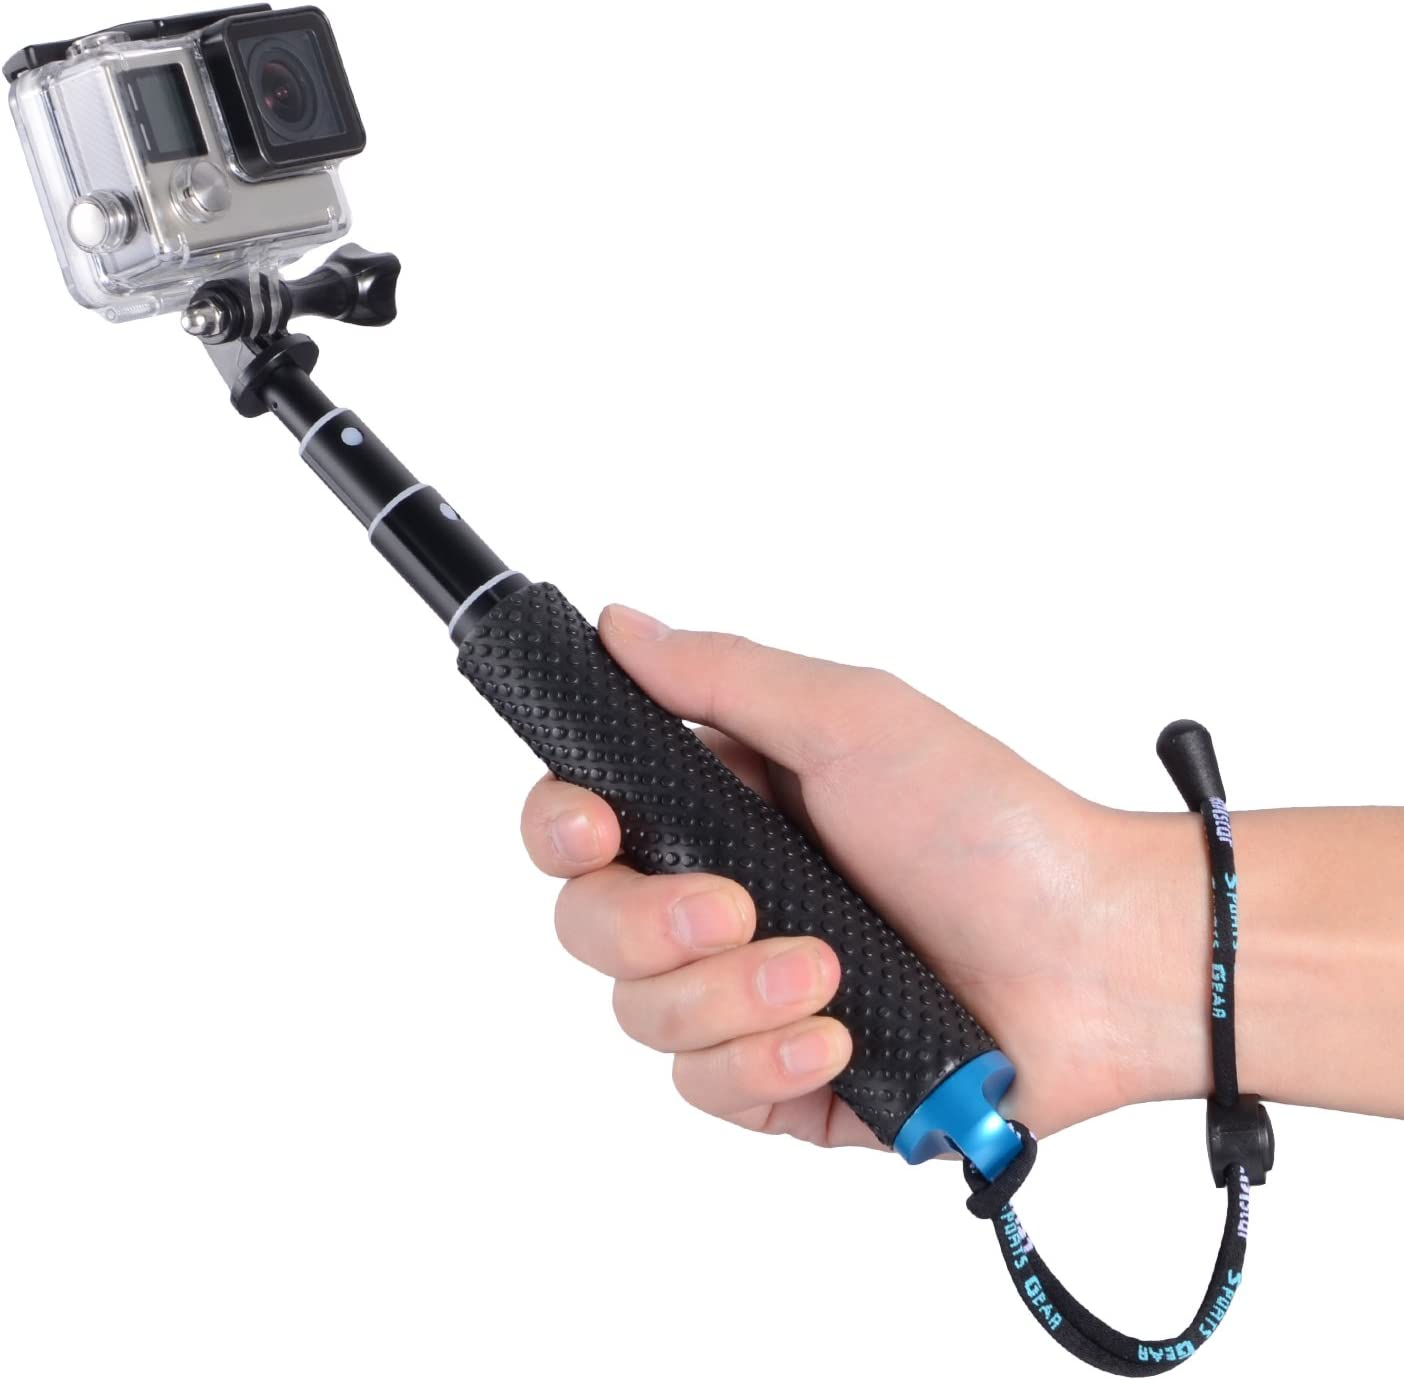 "Trehapuva Selfie Stick AKASO 2018 19/"" Waterproof Hand Grip Adjustable Extension Monopod Pole Compatible With GoPro Hero Hero 7 6 5 4 3+3 2 1 Session Blue Xiaomi Yi,SJCAM SJ4000 SJ5000 SJ6000 More"